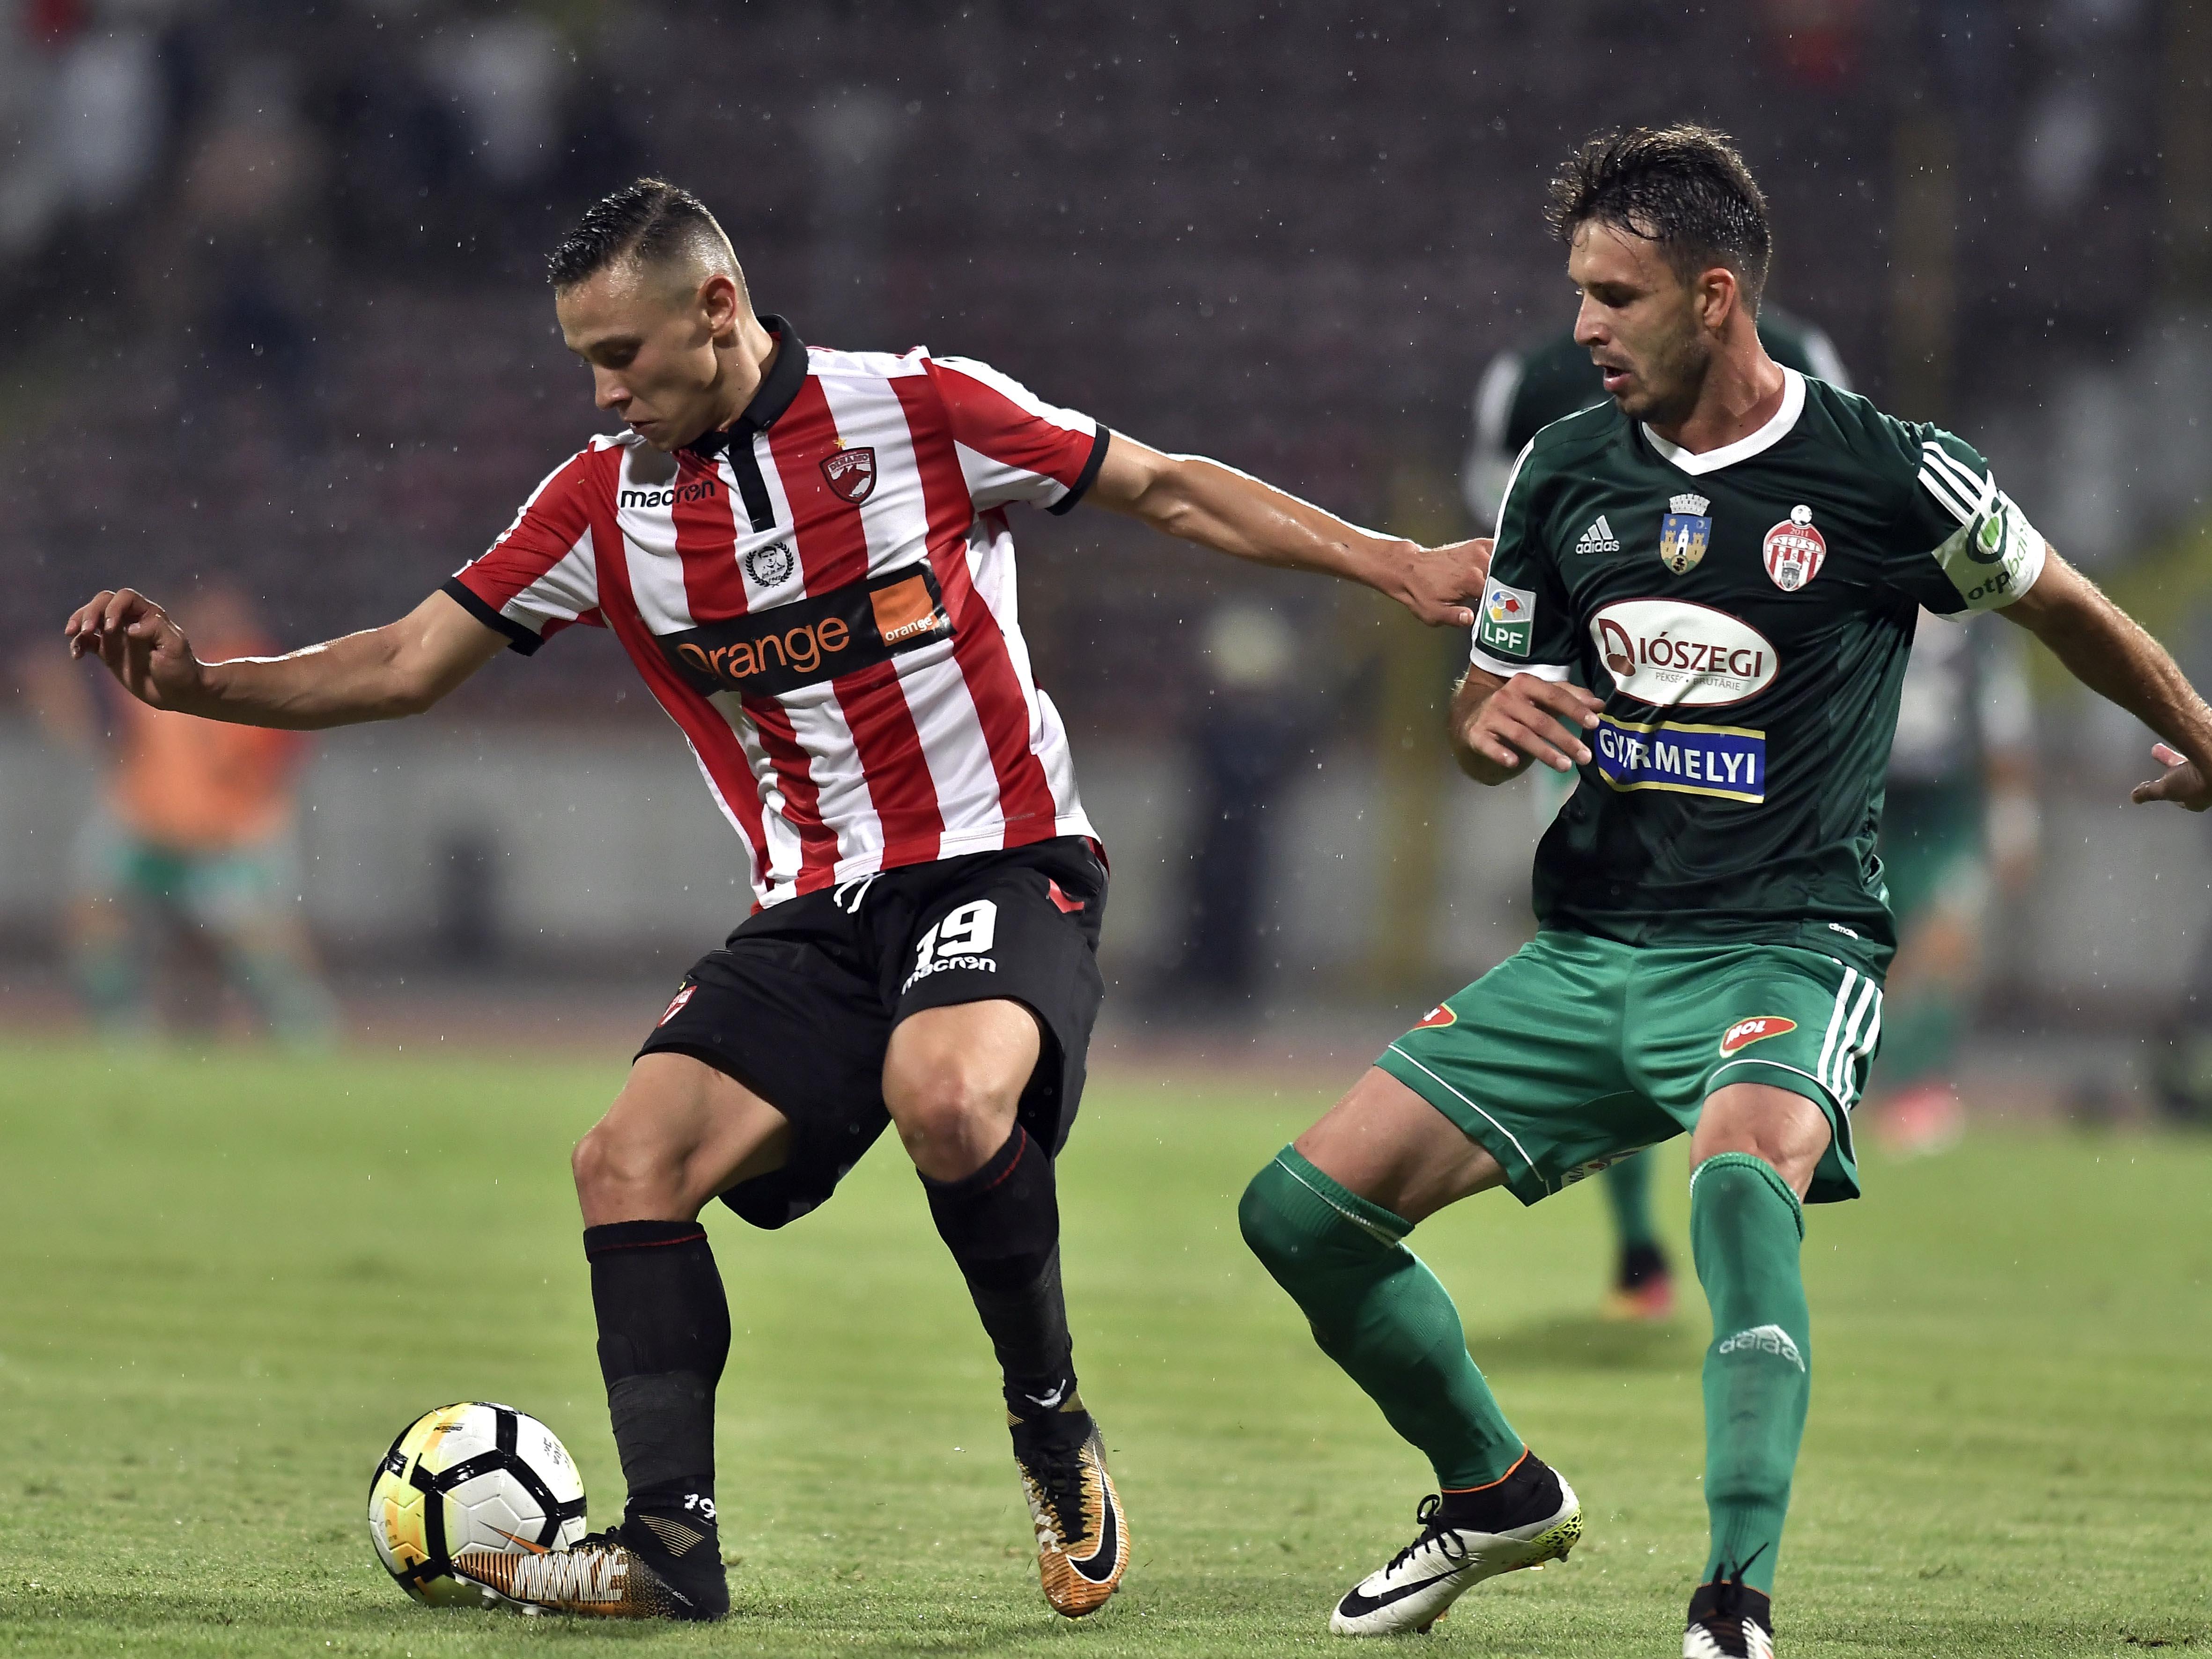 Velntin Costache a fost vândut de Dinamo la CFR Cluj